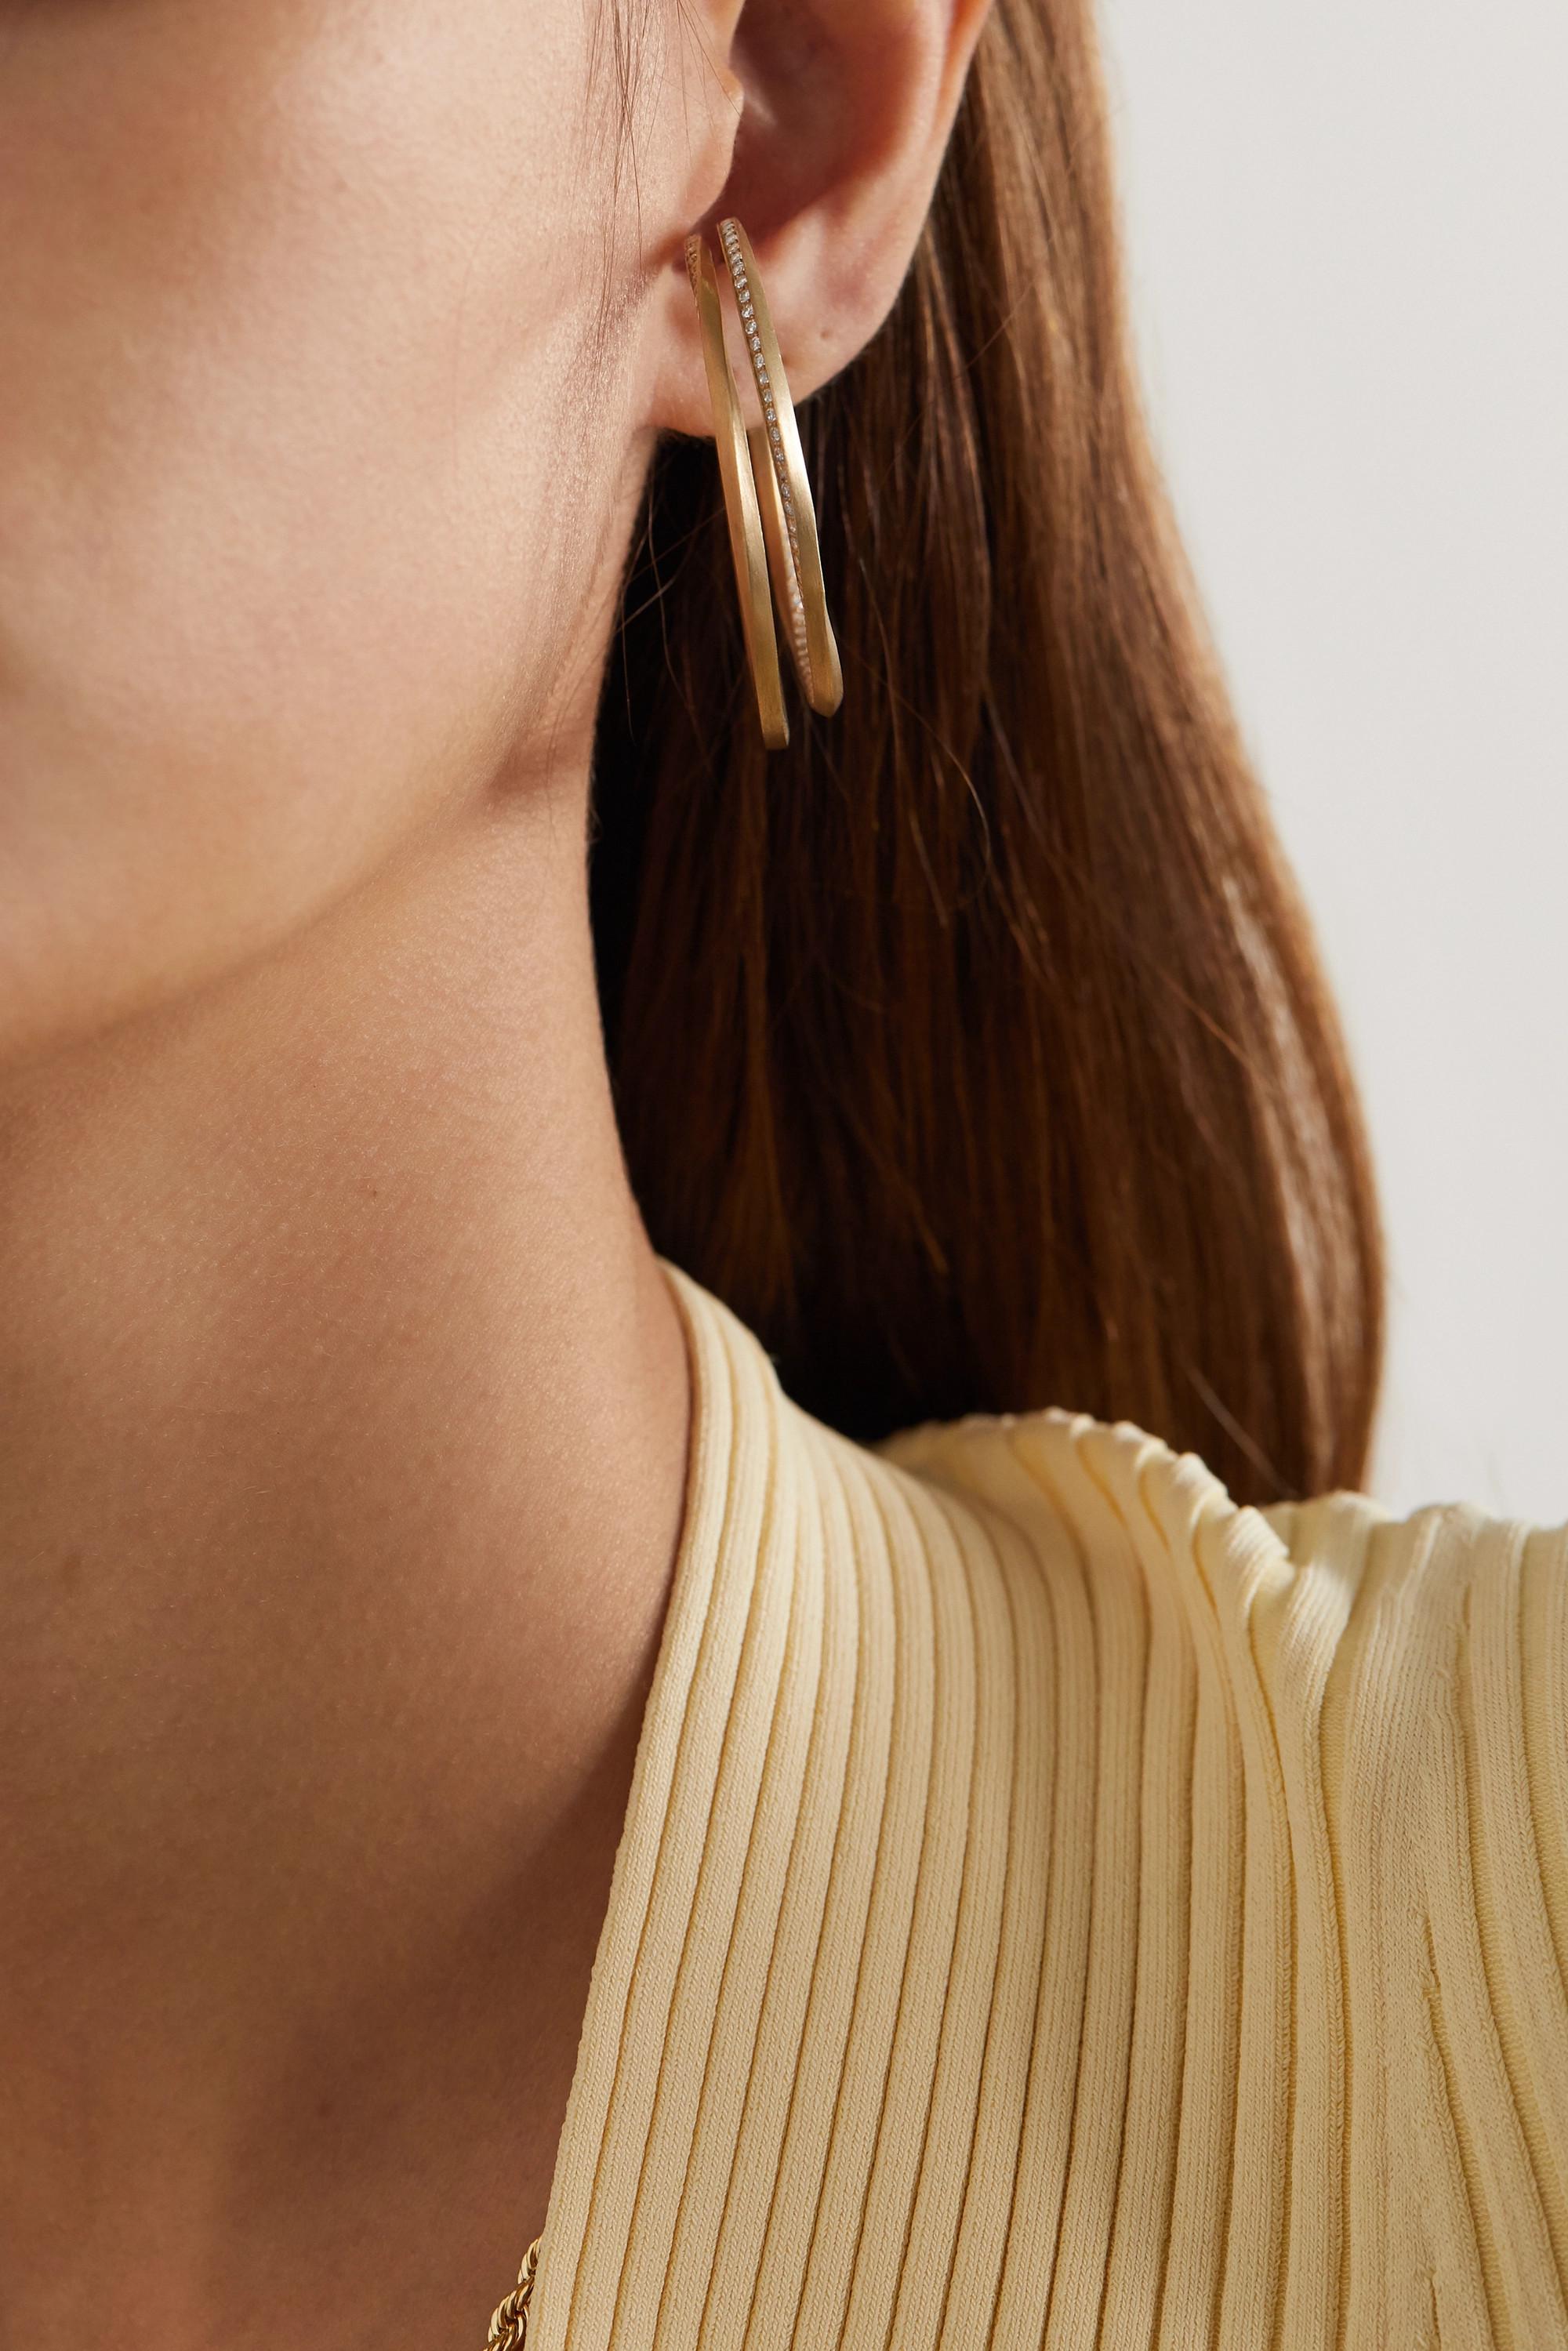 Completedworks Domain gold vermeil topaz ear cuff